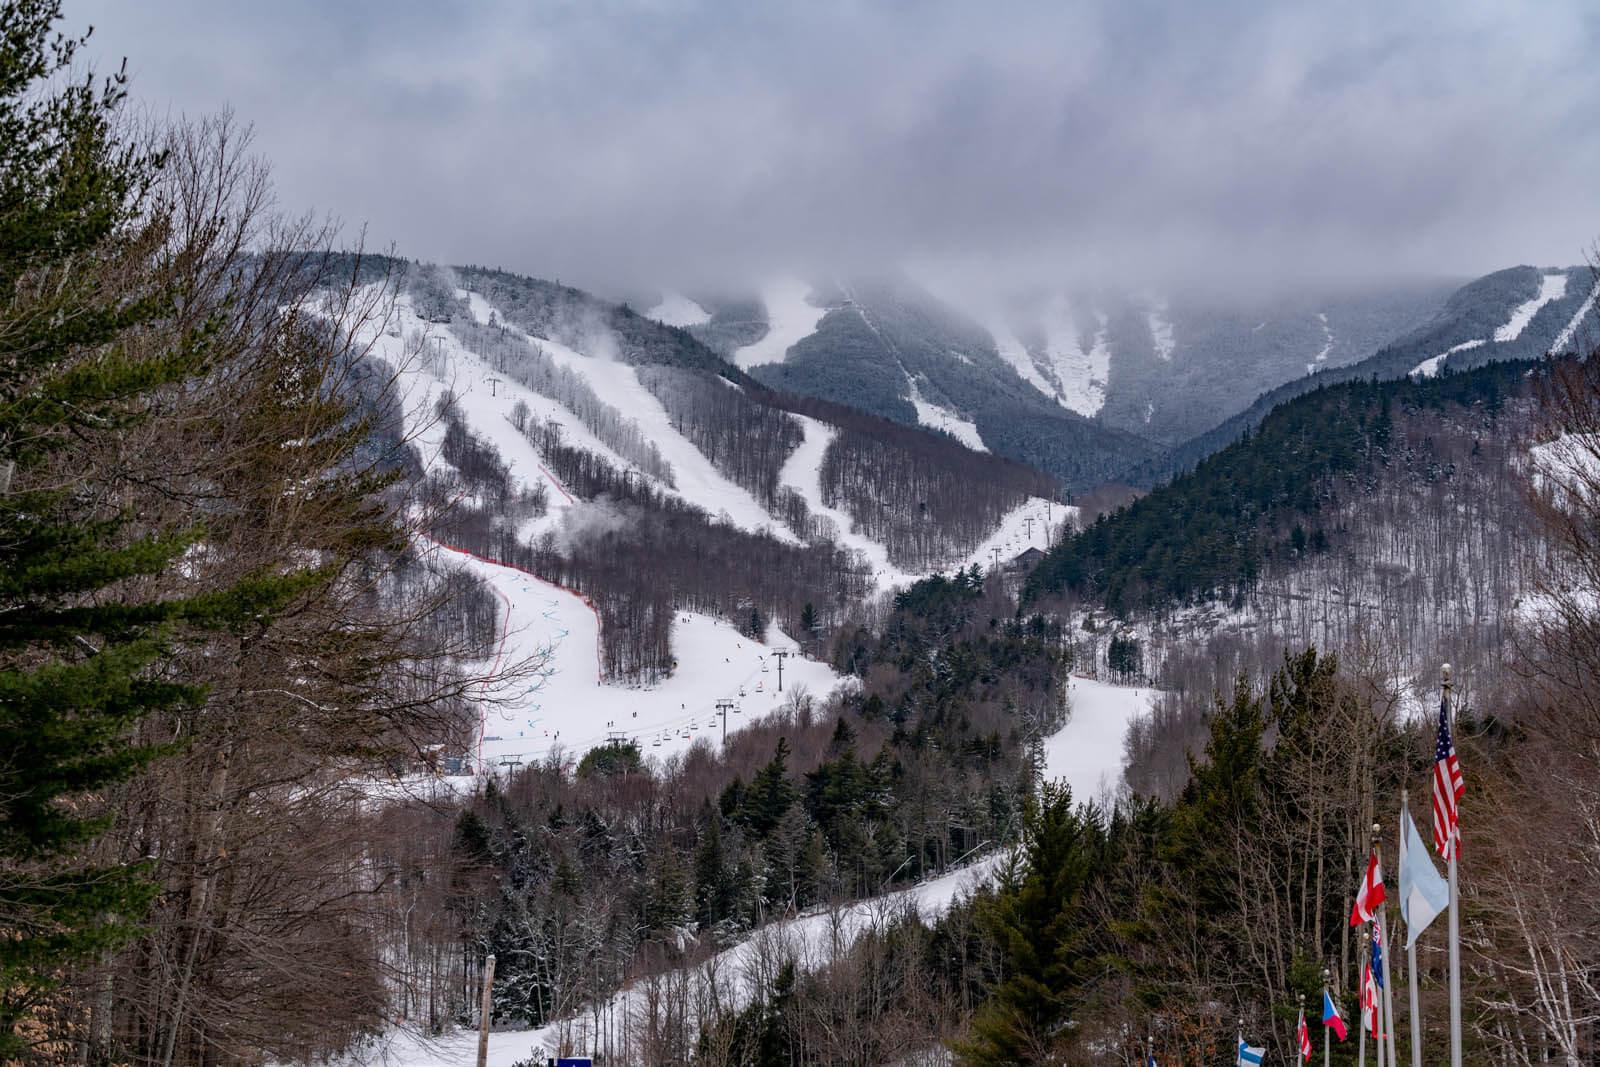 White Face Mountain ski resort near Lake Placid in the Adirondacks in New York